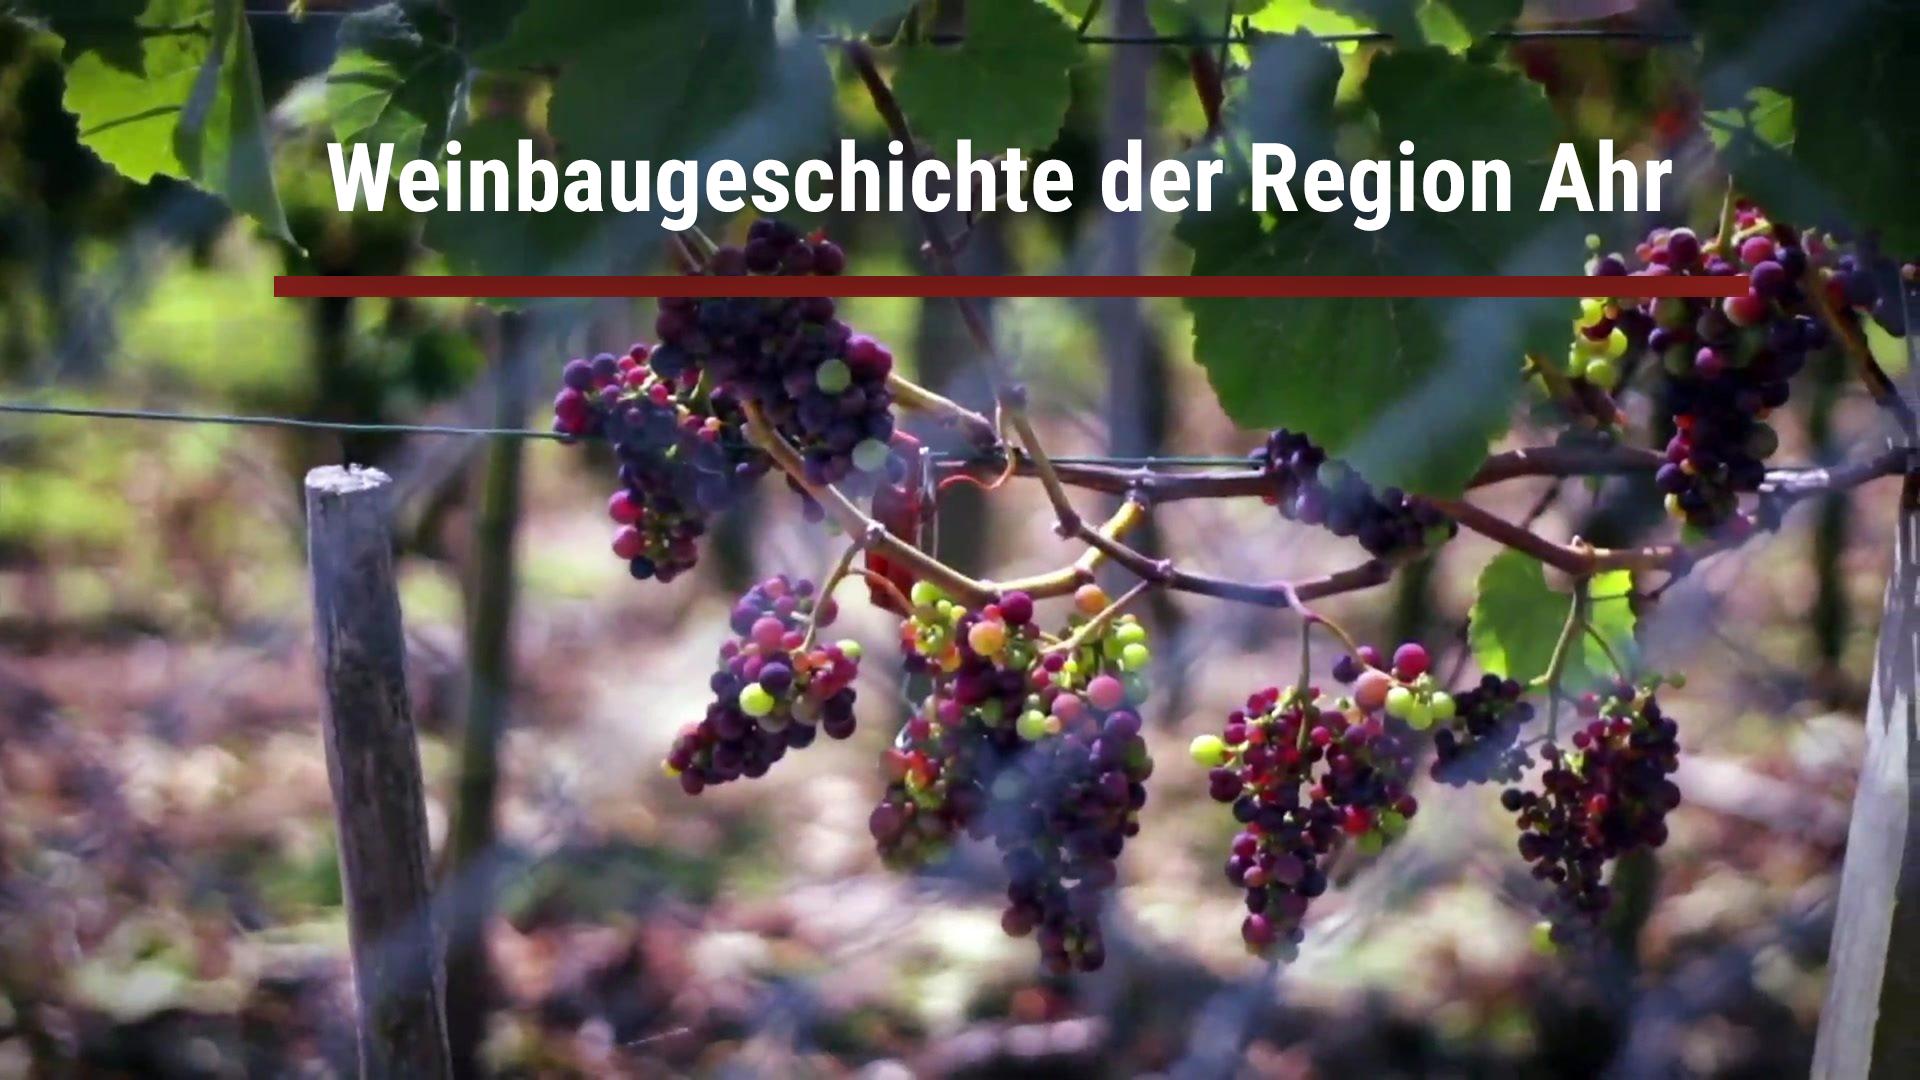 Wine-growing history of the Ahr region